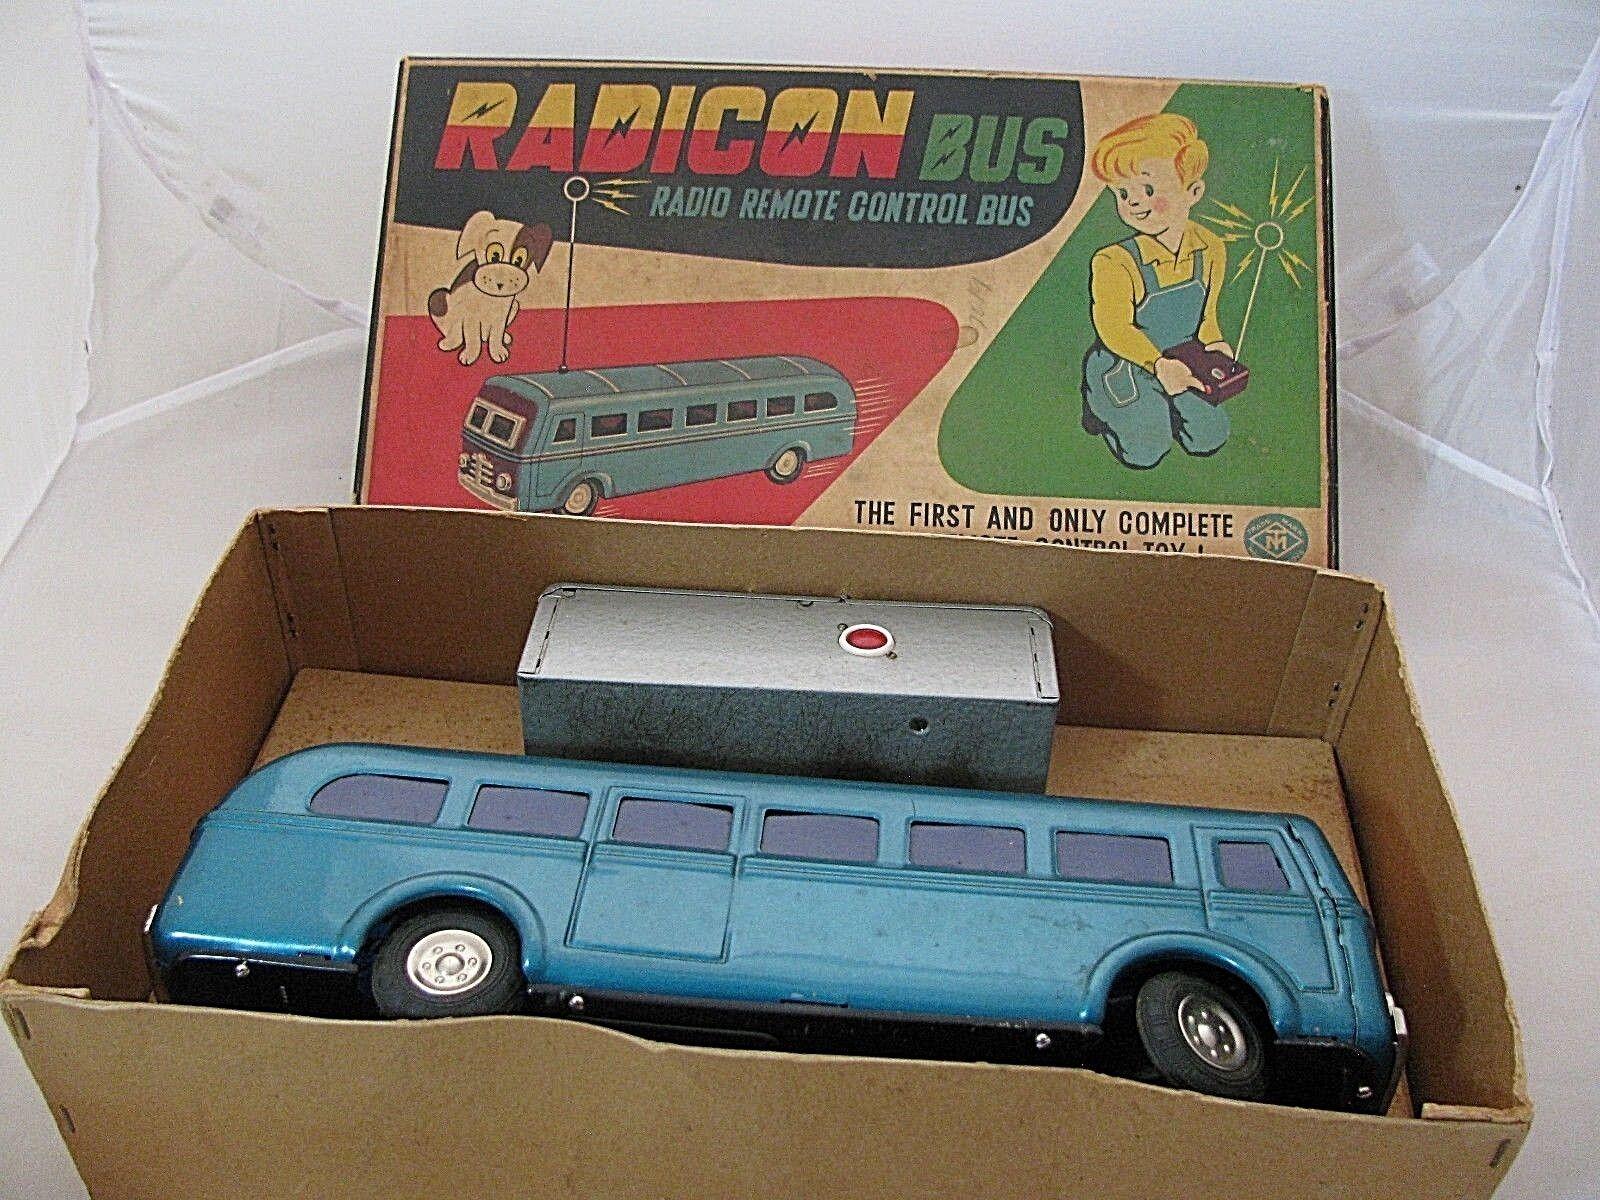 VINTAGE 1950's  TM MODERN TOYS RADICON BUS in ORIGINAL BOX  RADIO REMOTE CONTROL